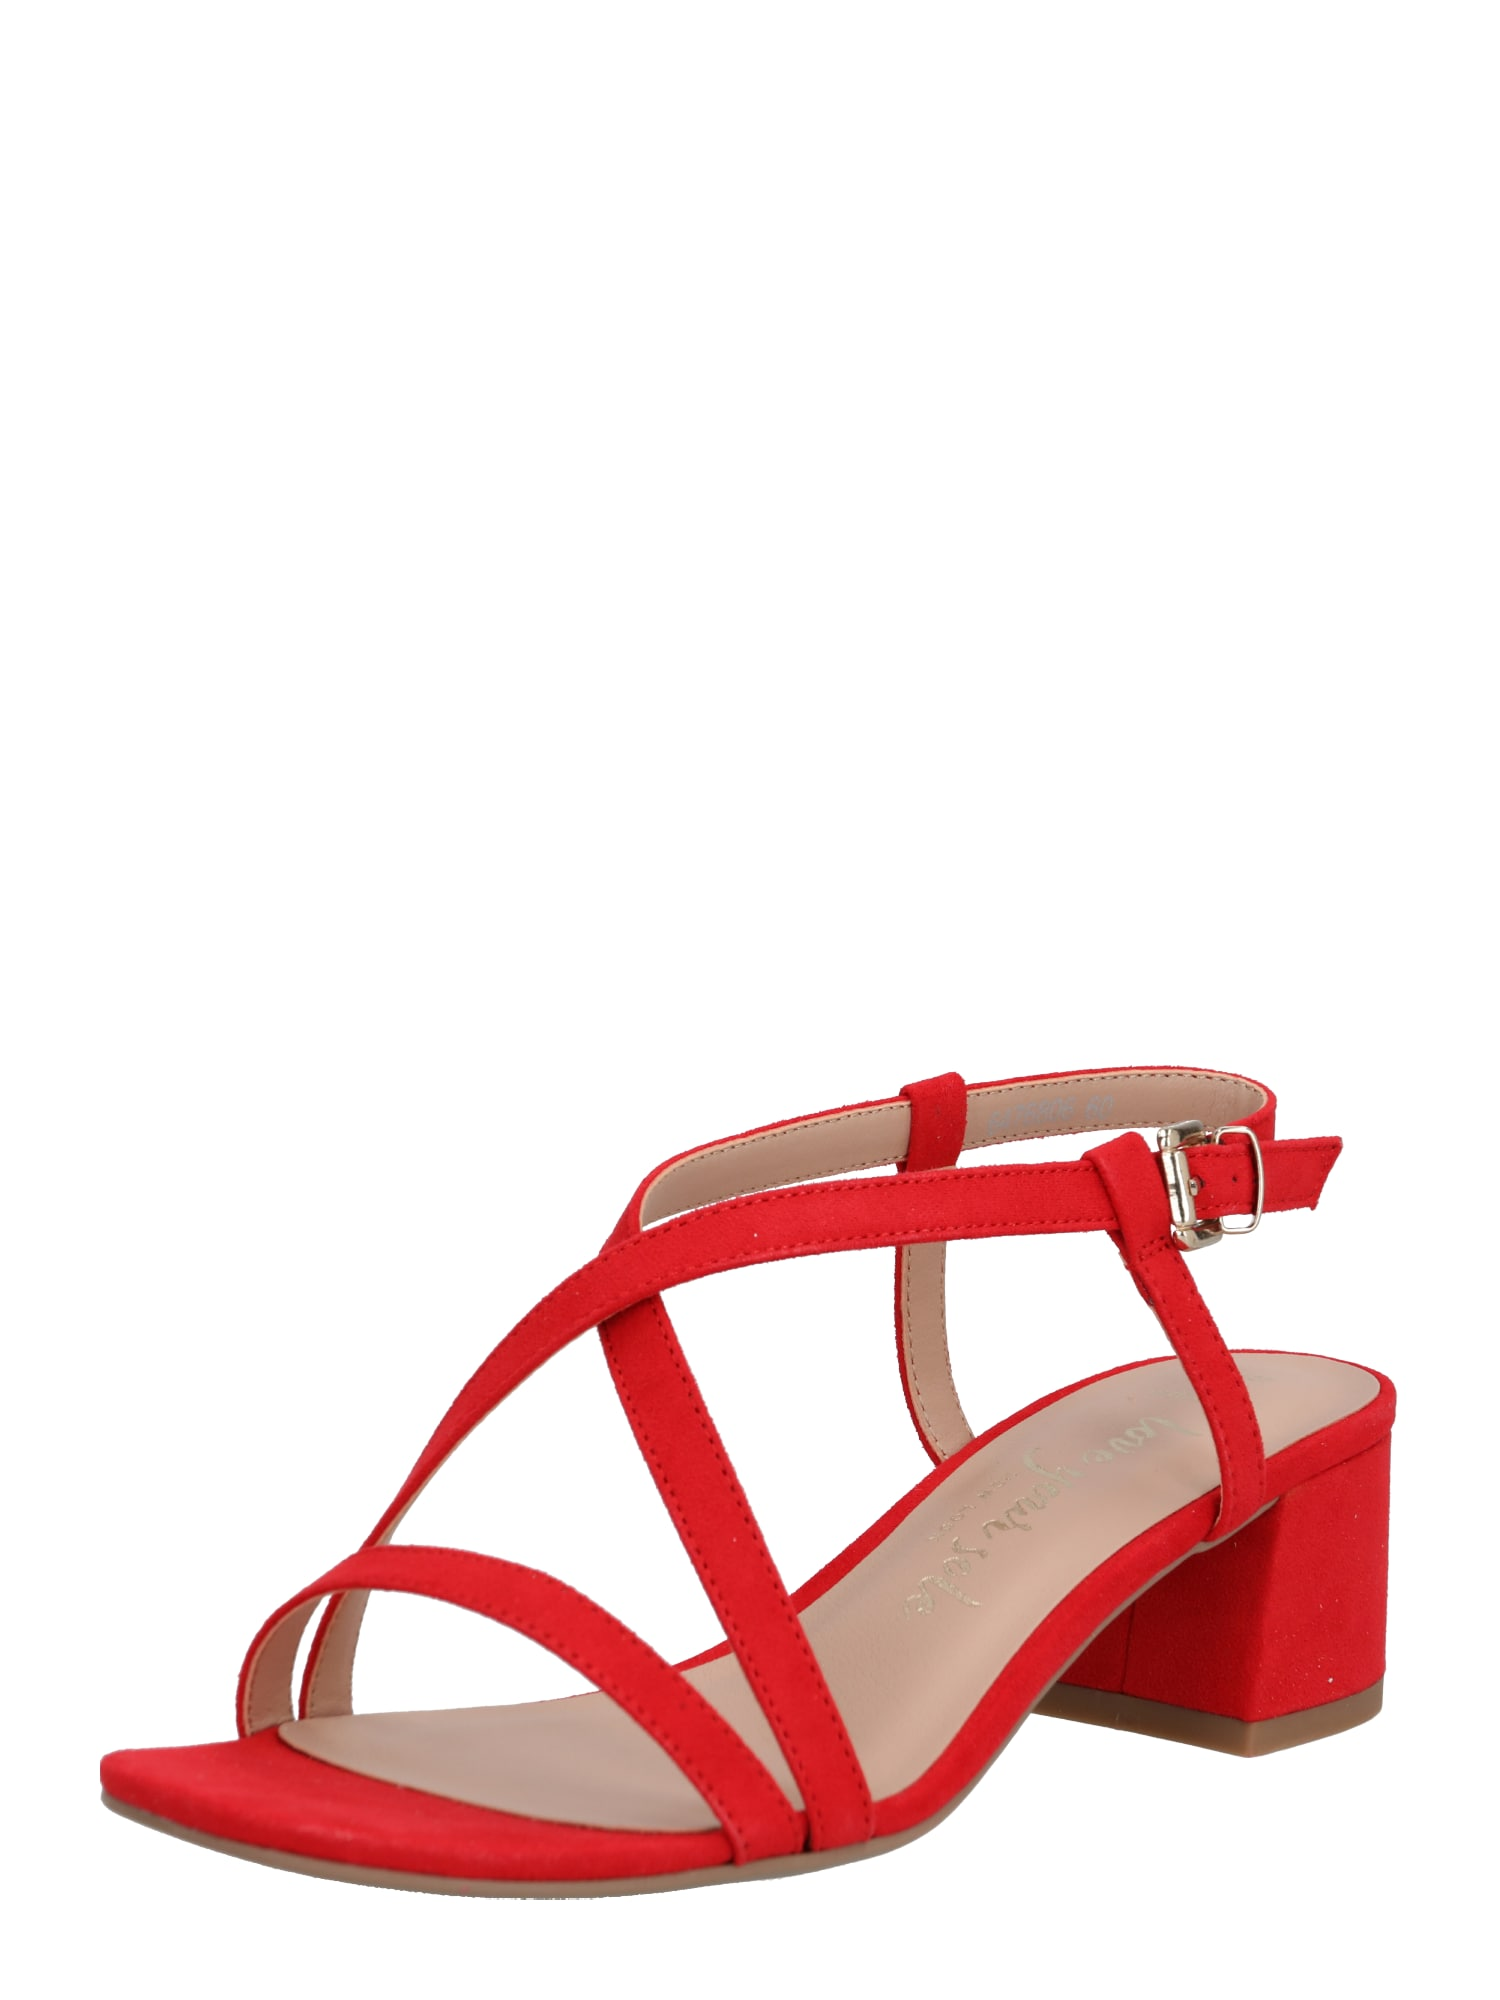 NEW LOOK Remienkové sandále 'WF RULIE'  červené